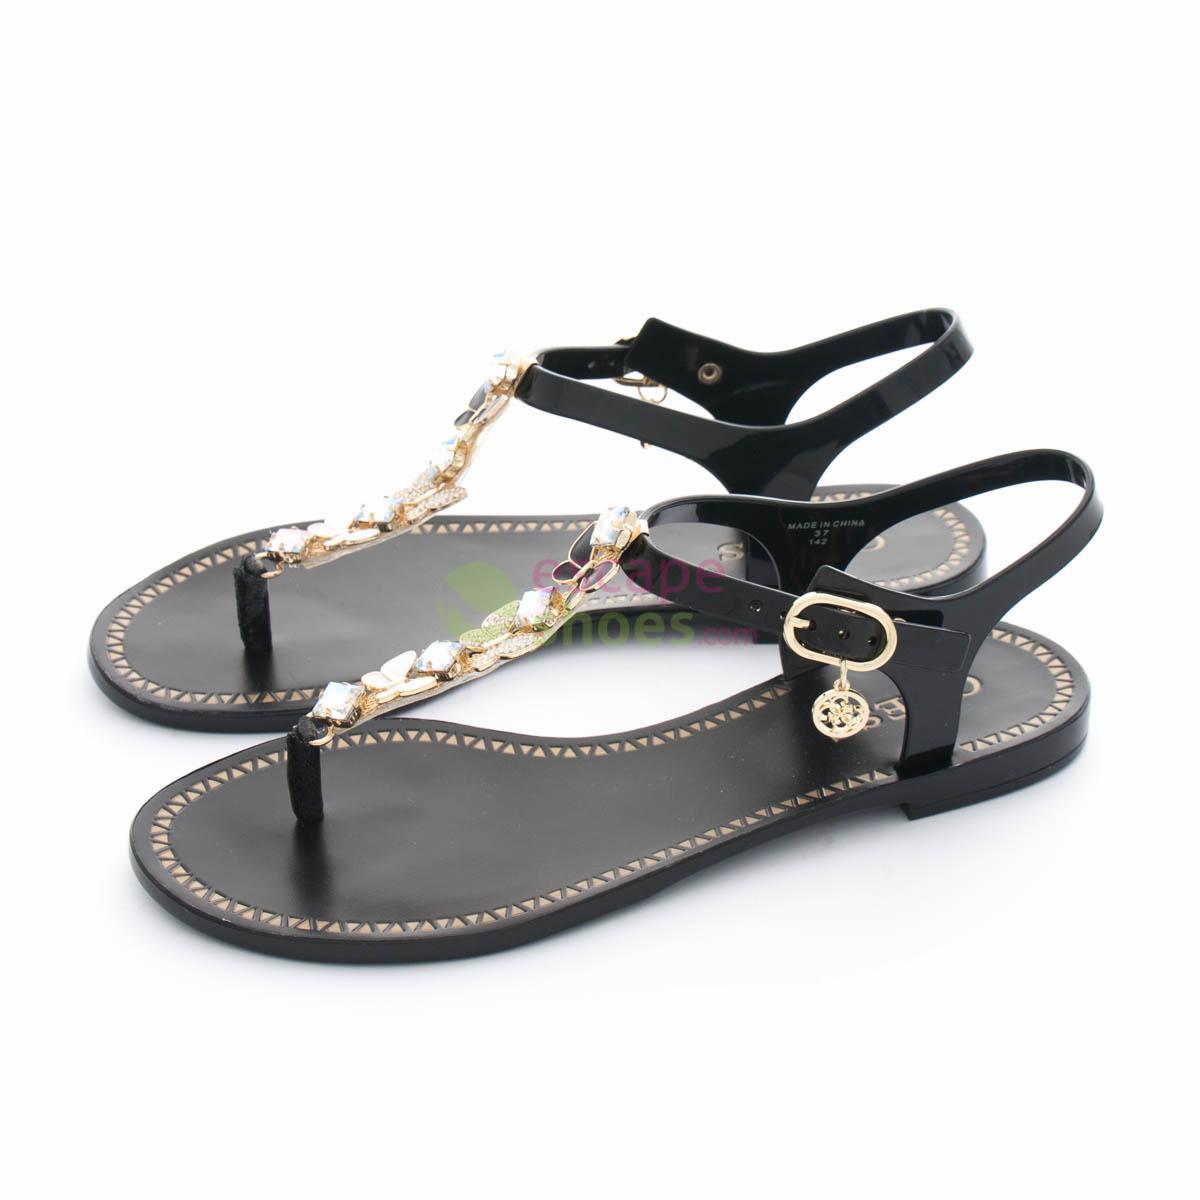 4e0e8eacc5c05 Buy your Sandals GUESS Rubber Adalinn Black FLAIN2RUB21 here ...